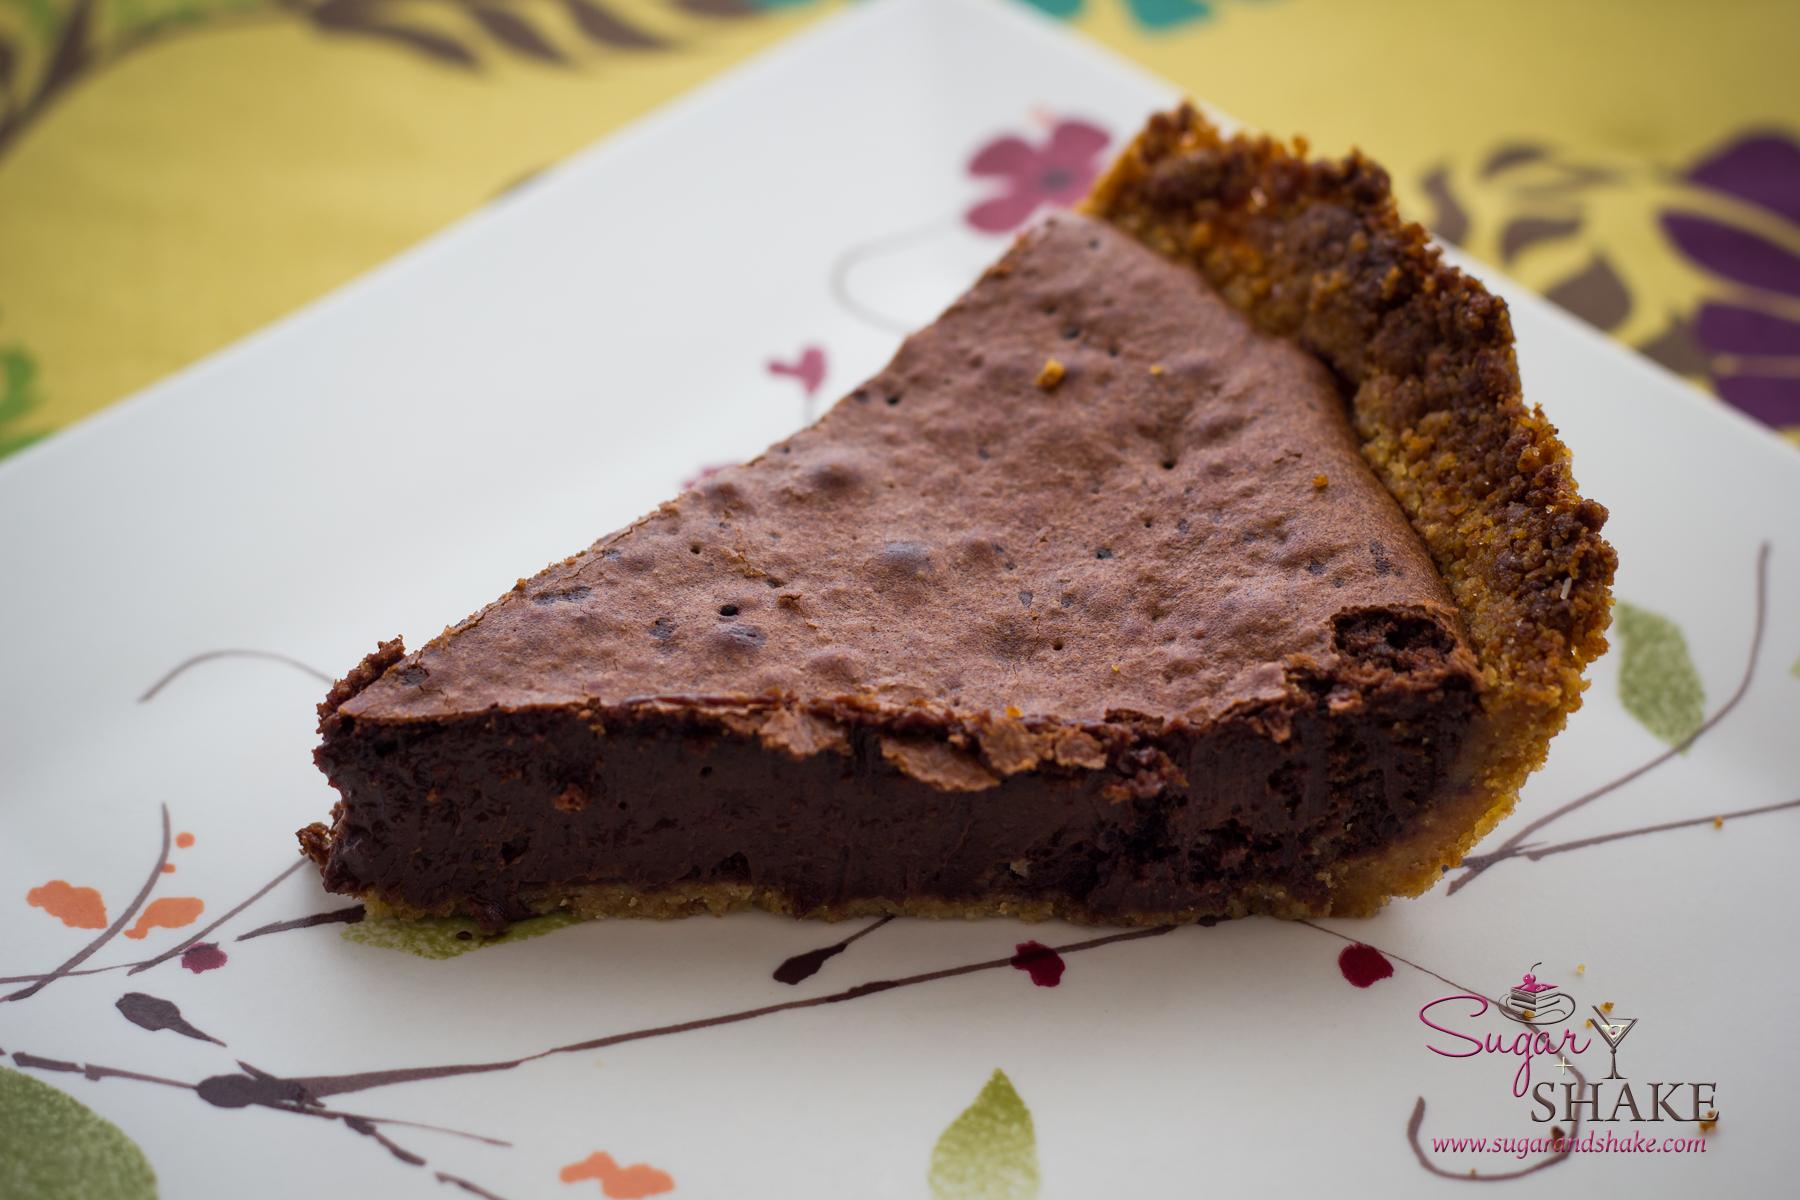 Momofuku Milk Bar Brownie Pie. © 2013 Sugar + Shake